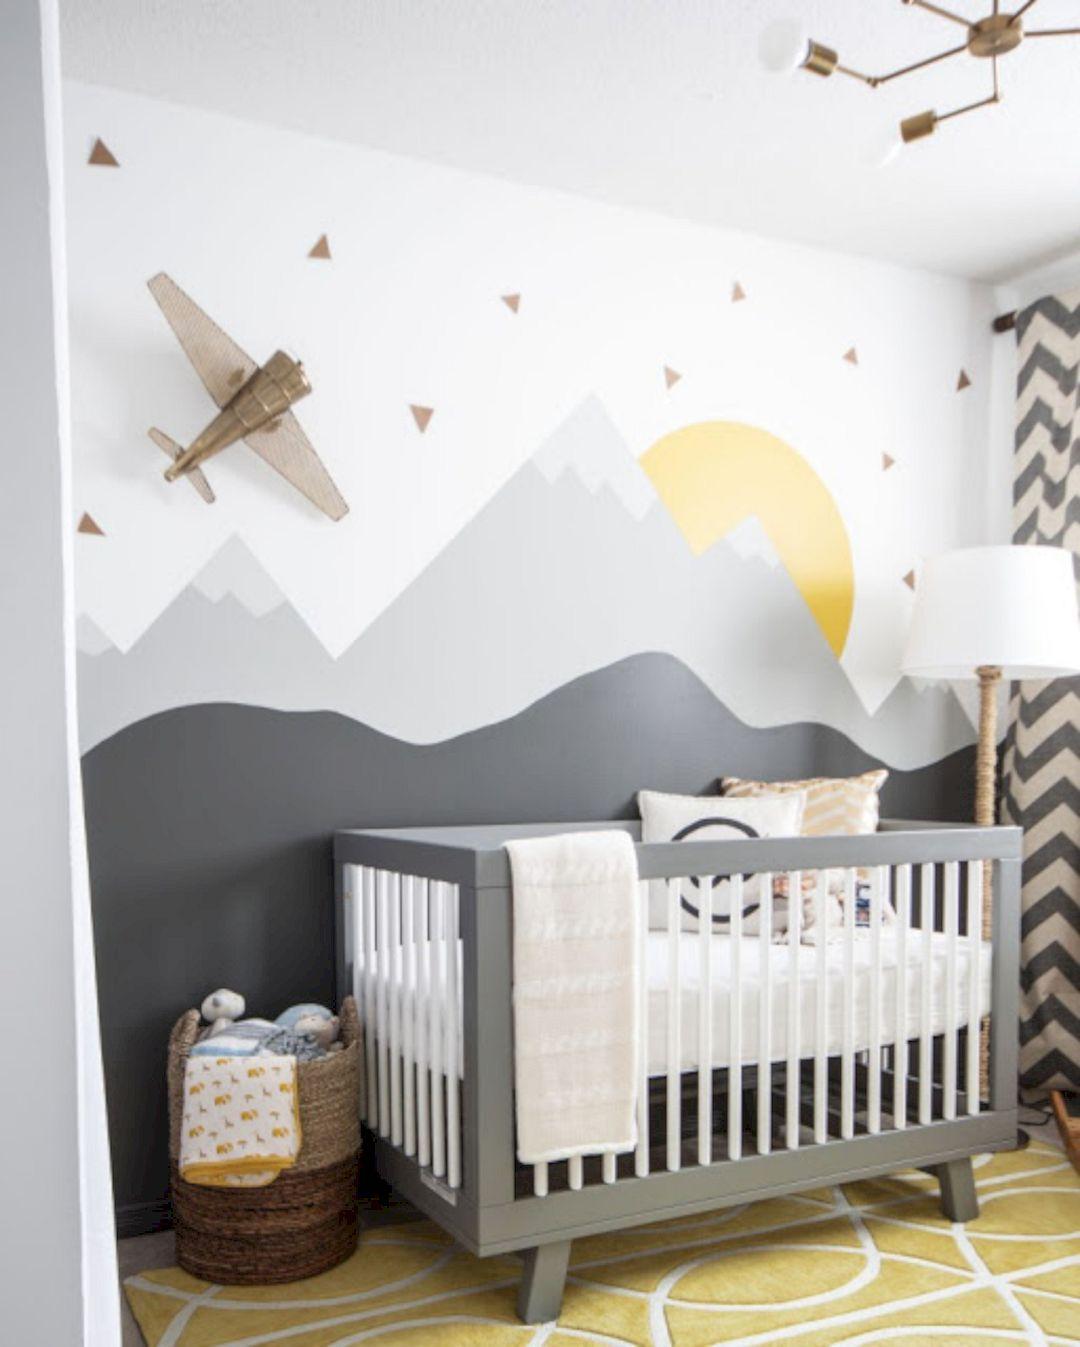 5 Cool Bedroom Interior Design Ideas Baby Room Decor Kids Bedroom Decor Kid Room Decor